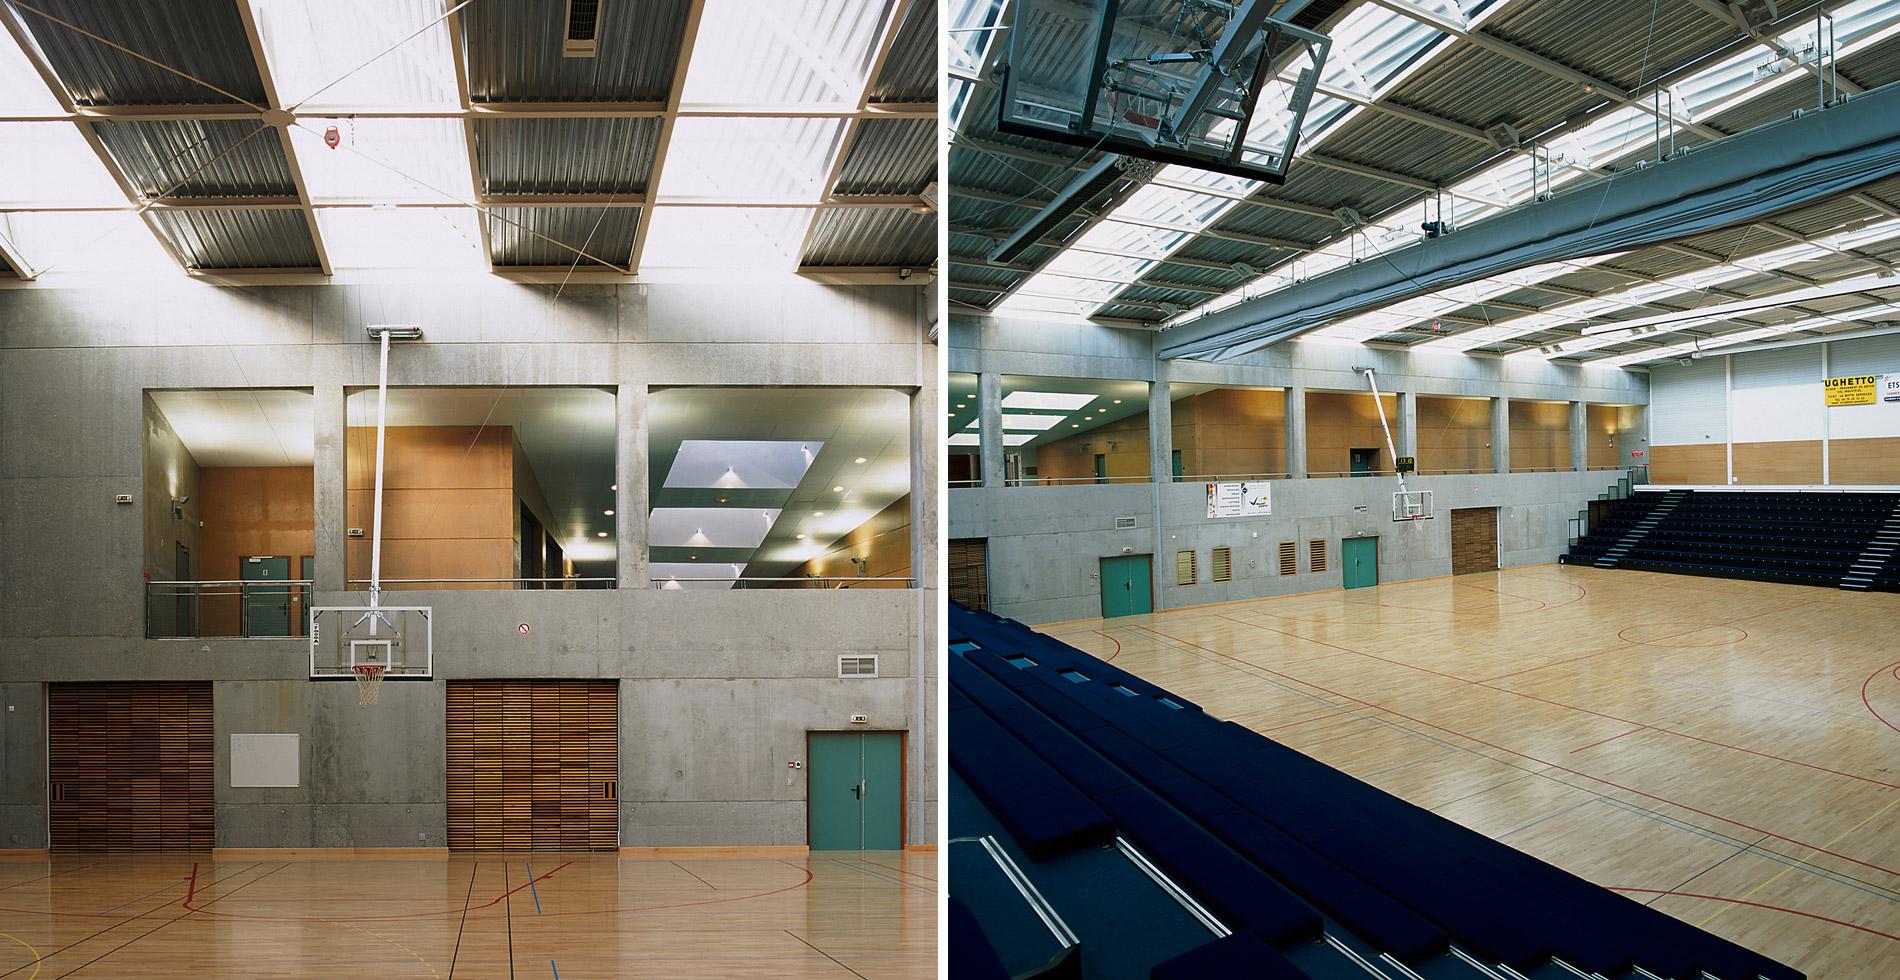 Salle basket Marlioz Aix-les-Bains